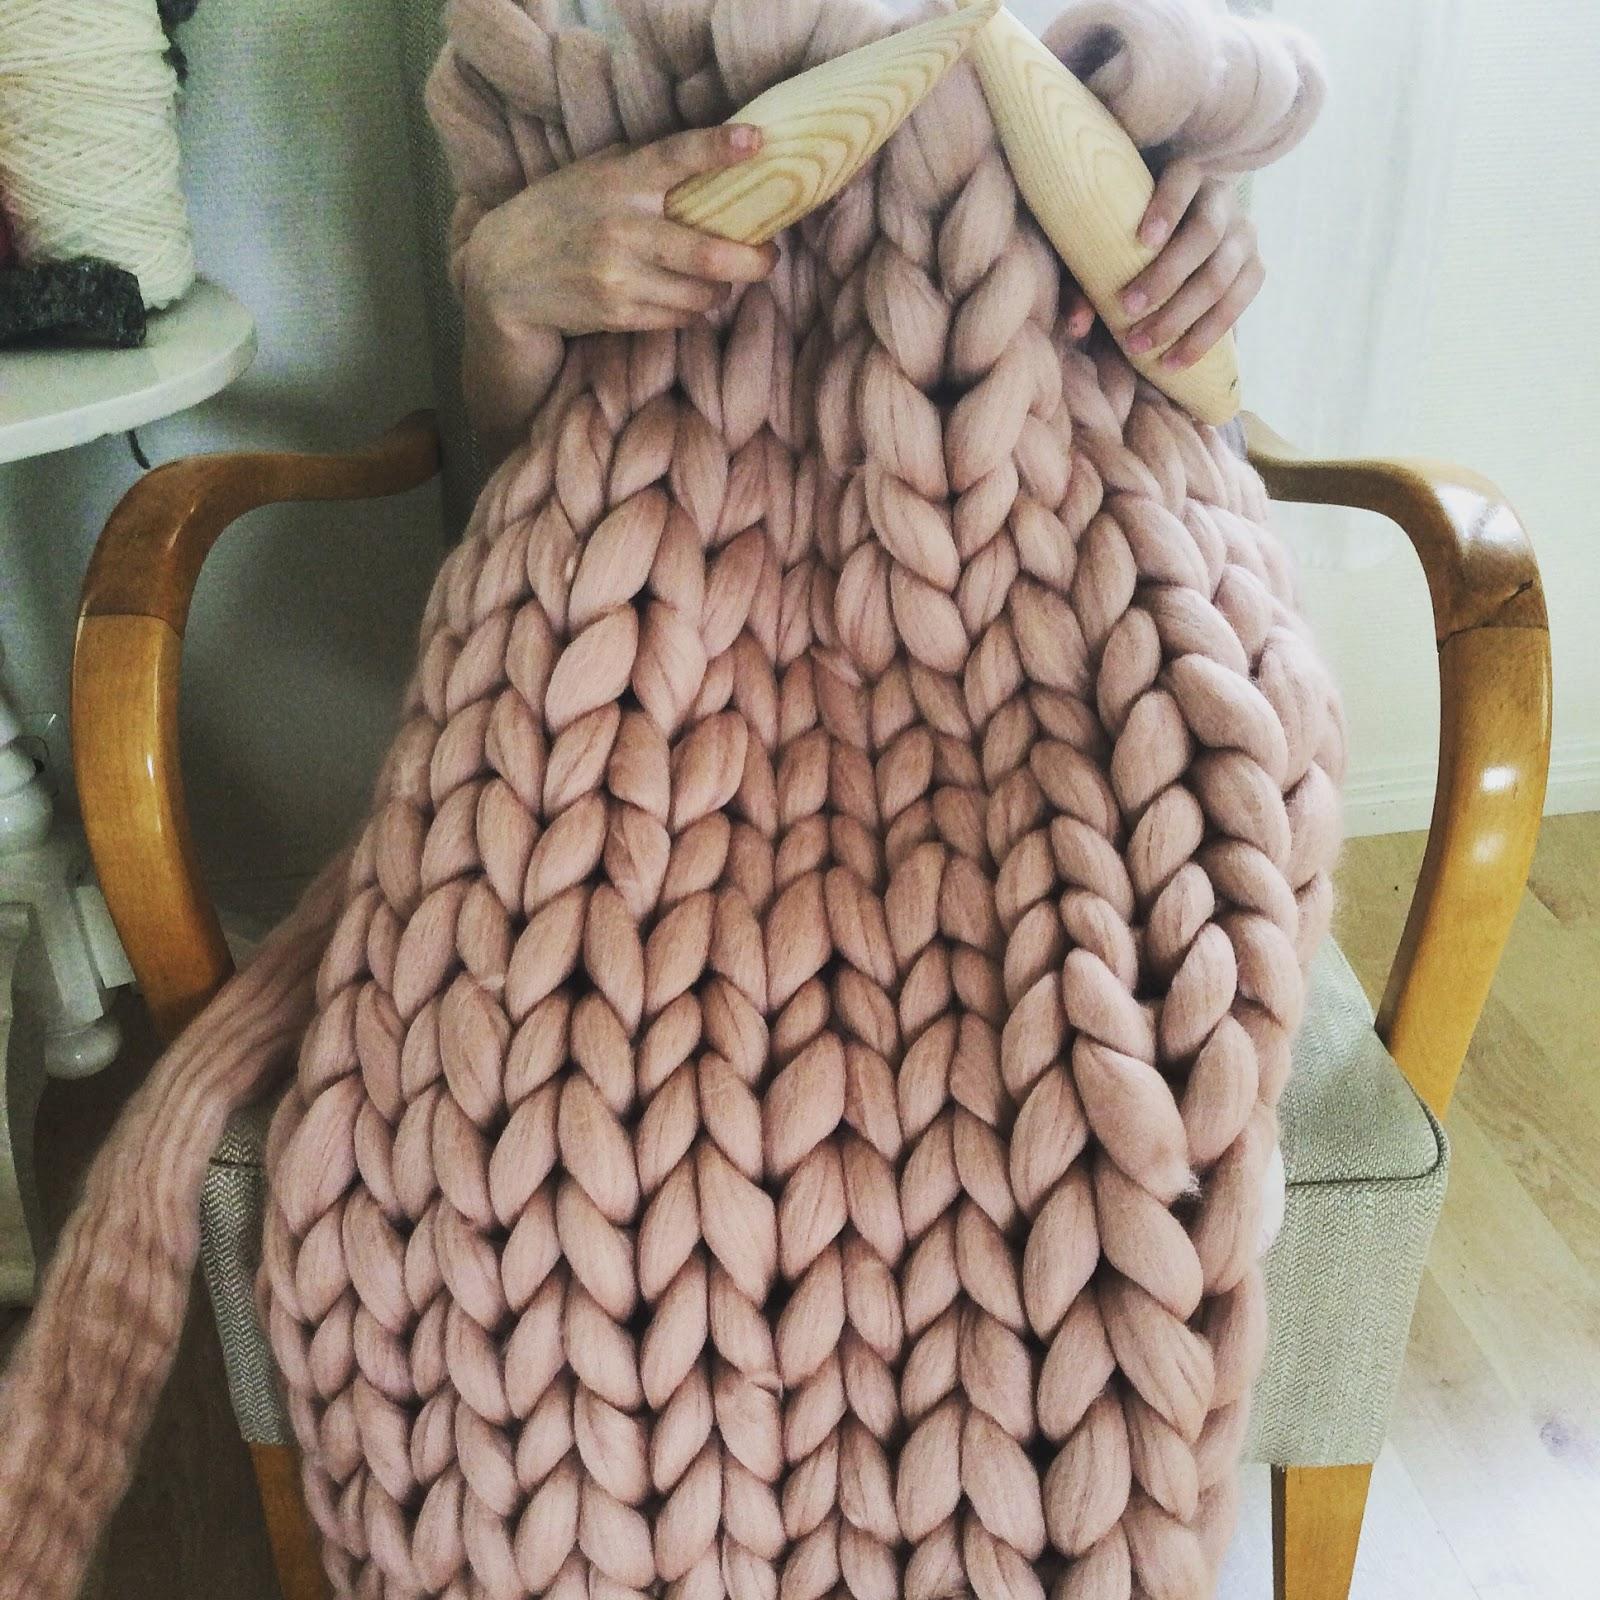 Extreme Knitting Blanket Pattern : TJOCKT: Knitted roving blanket - extreme knitting with 45mm needles